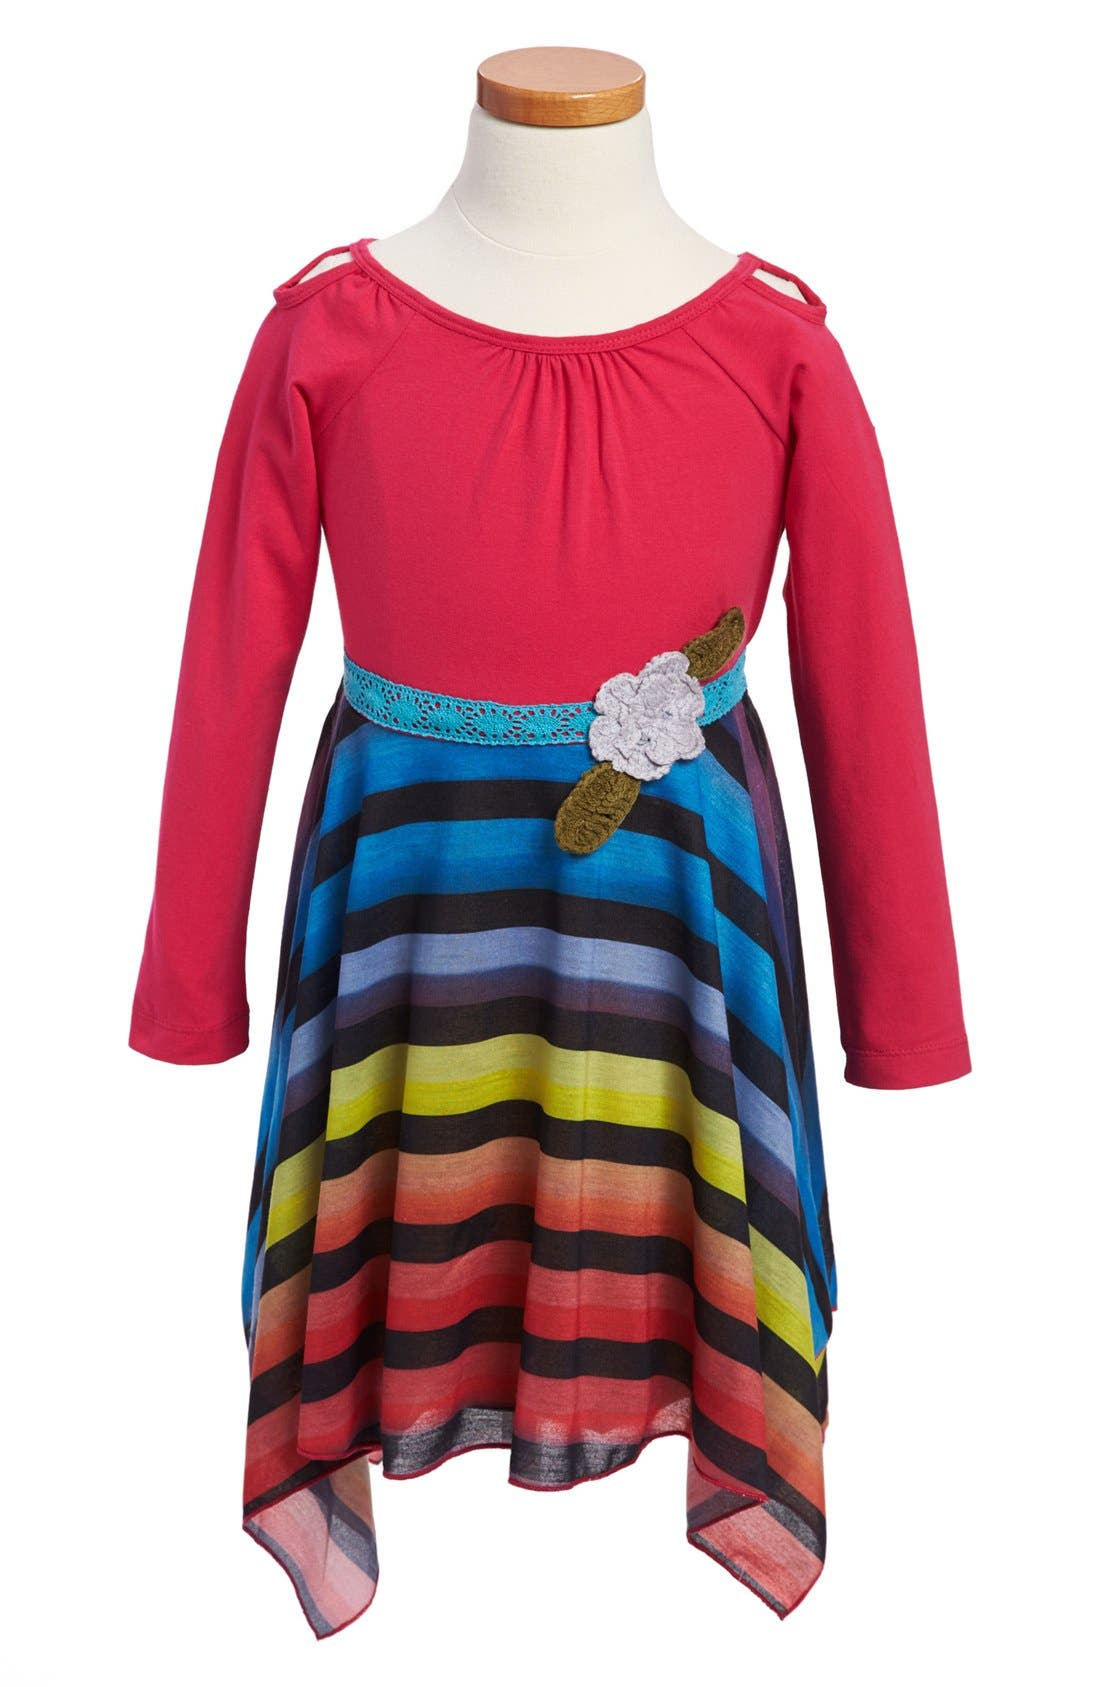 Main Image - Ella and Lulu Kidswear 'Shark Bite' Stripe Dress (Little Girls & Big Girls)